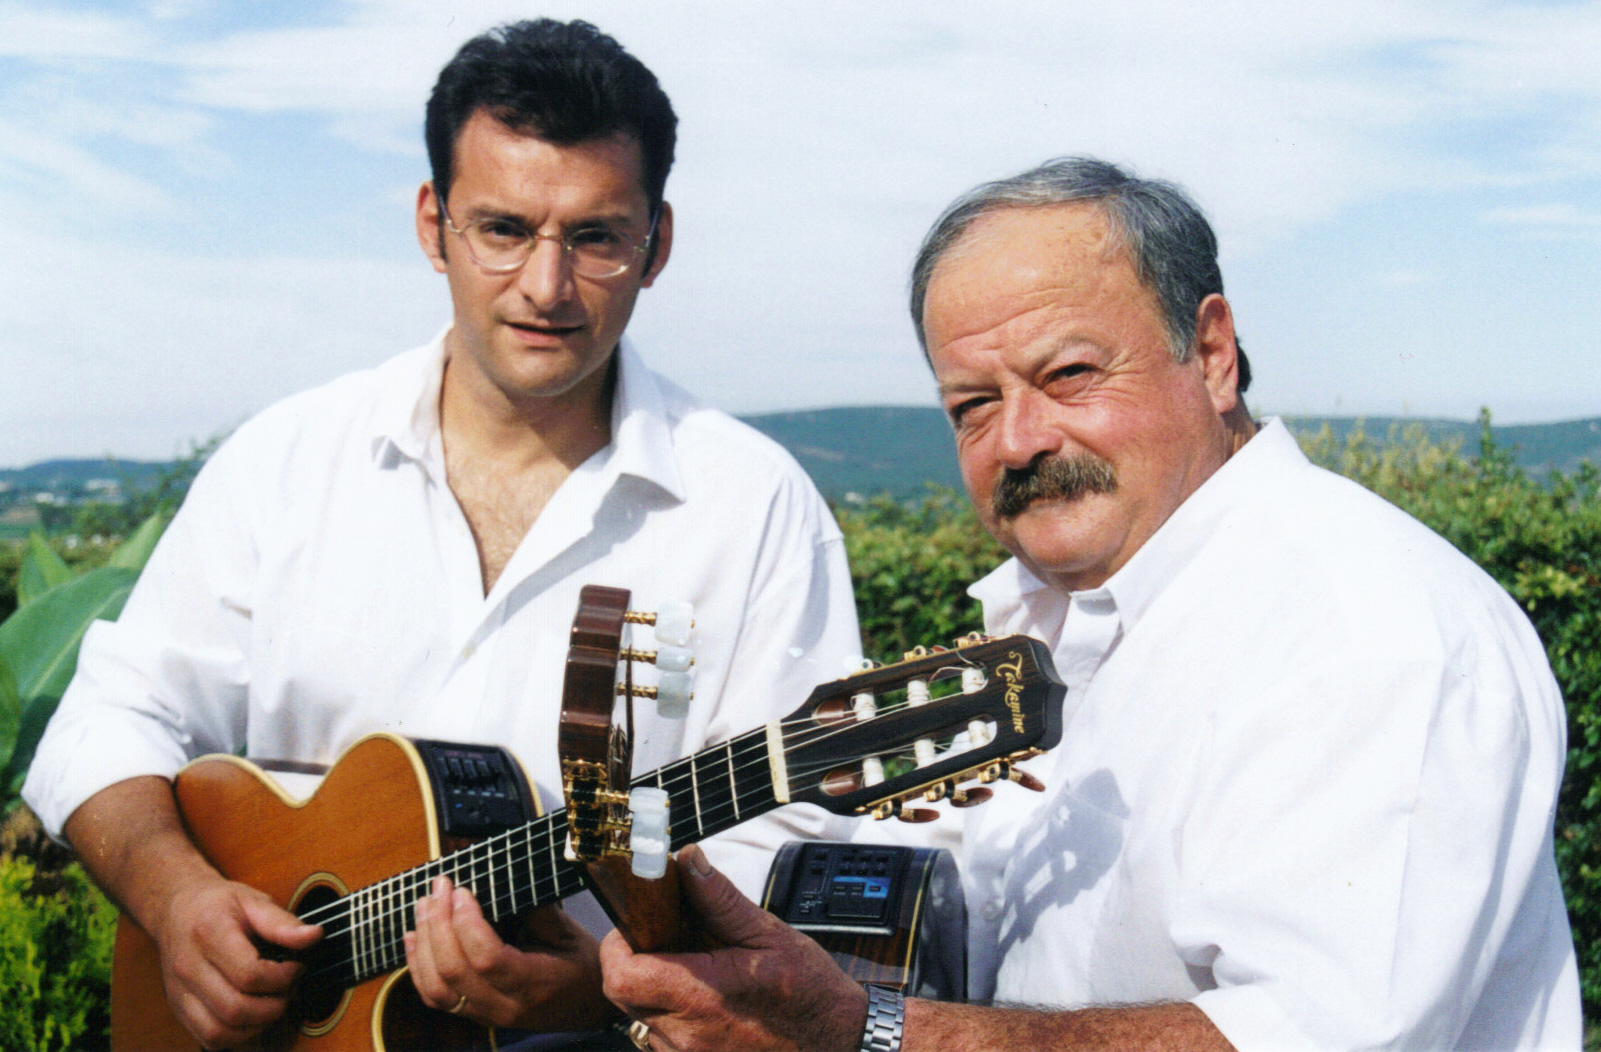 Bruno Granier et Claude Duguet